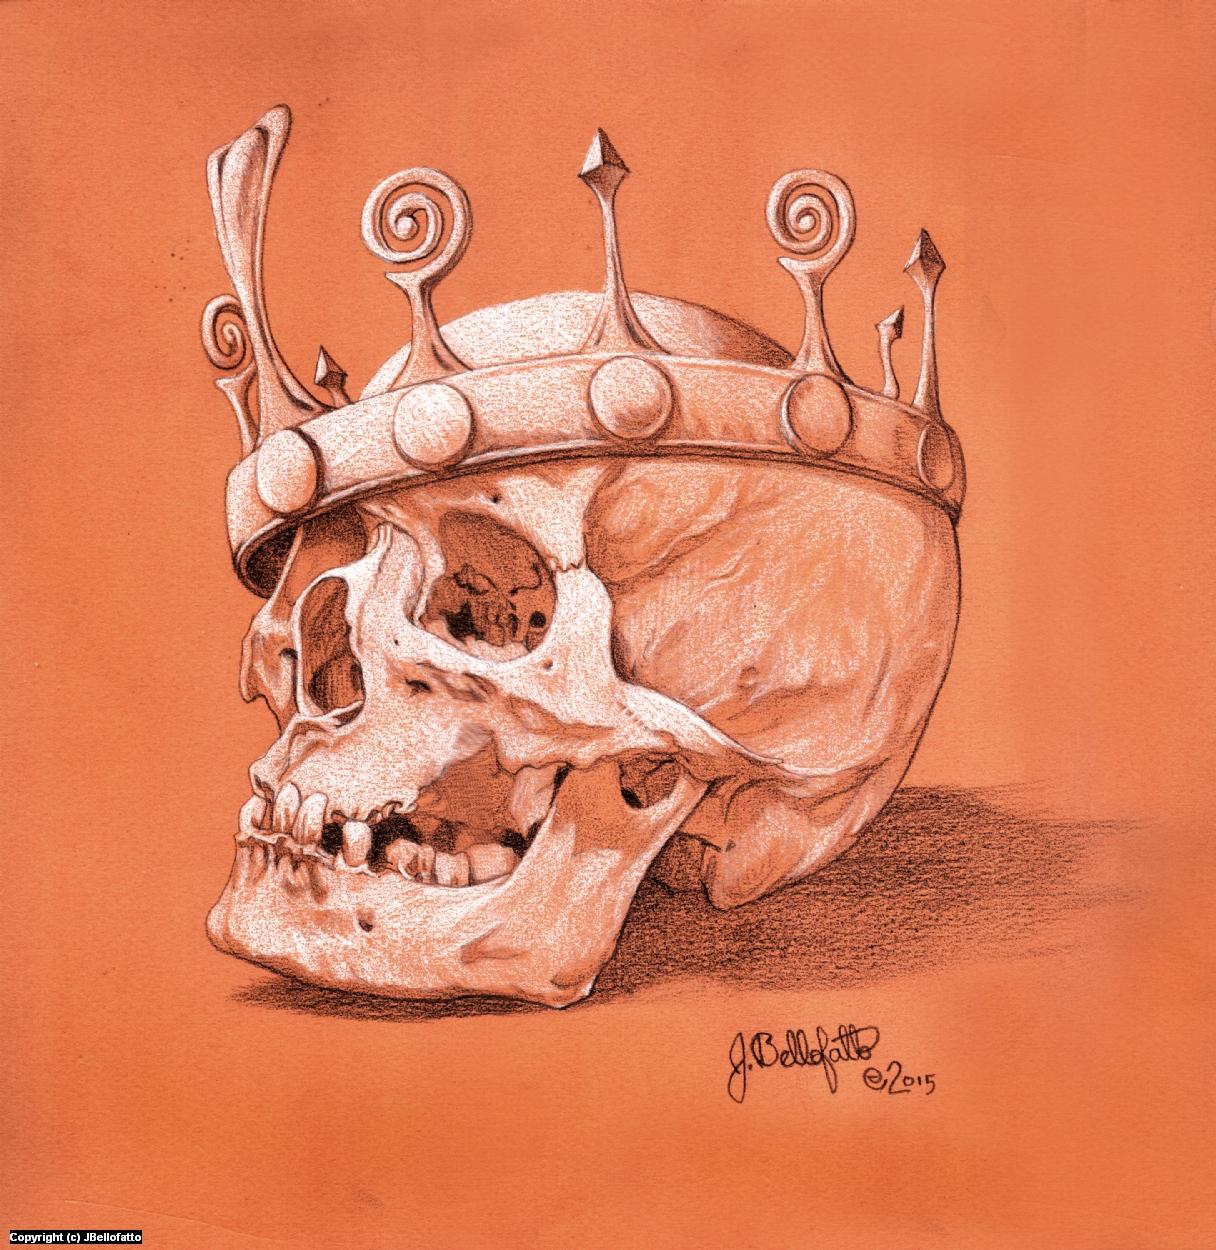 King of Pain  Artwork by Joseph Bellofatto